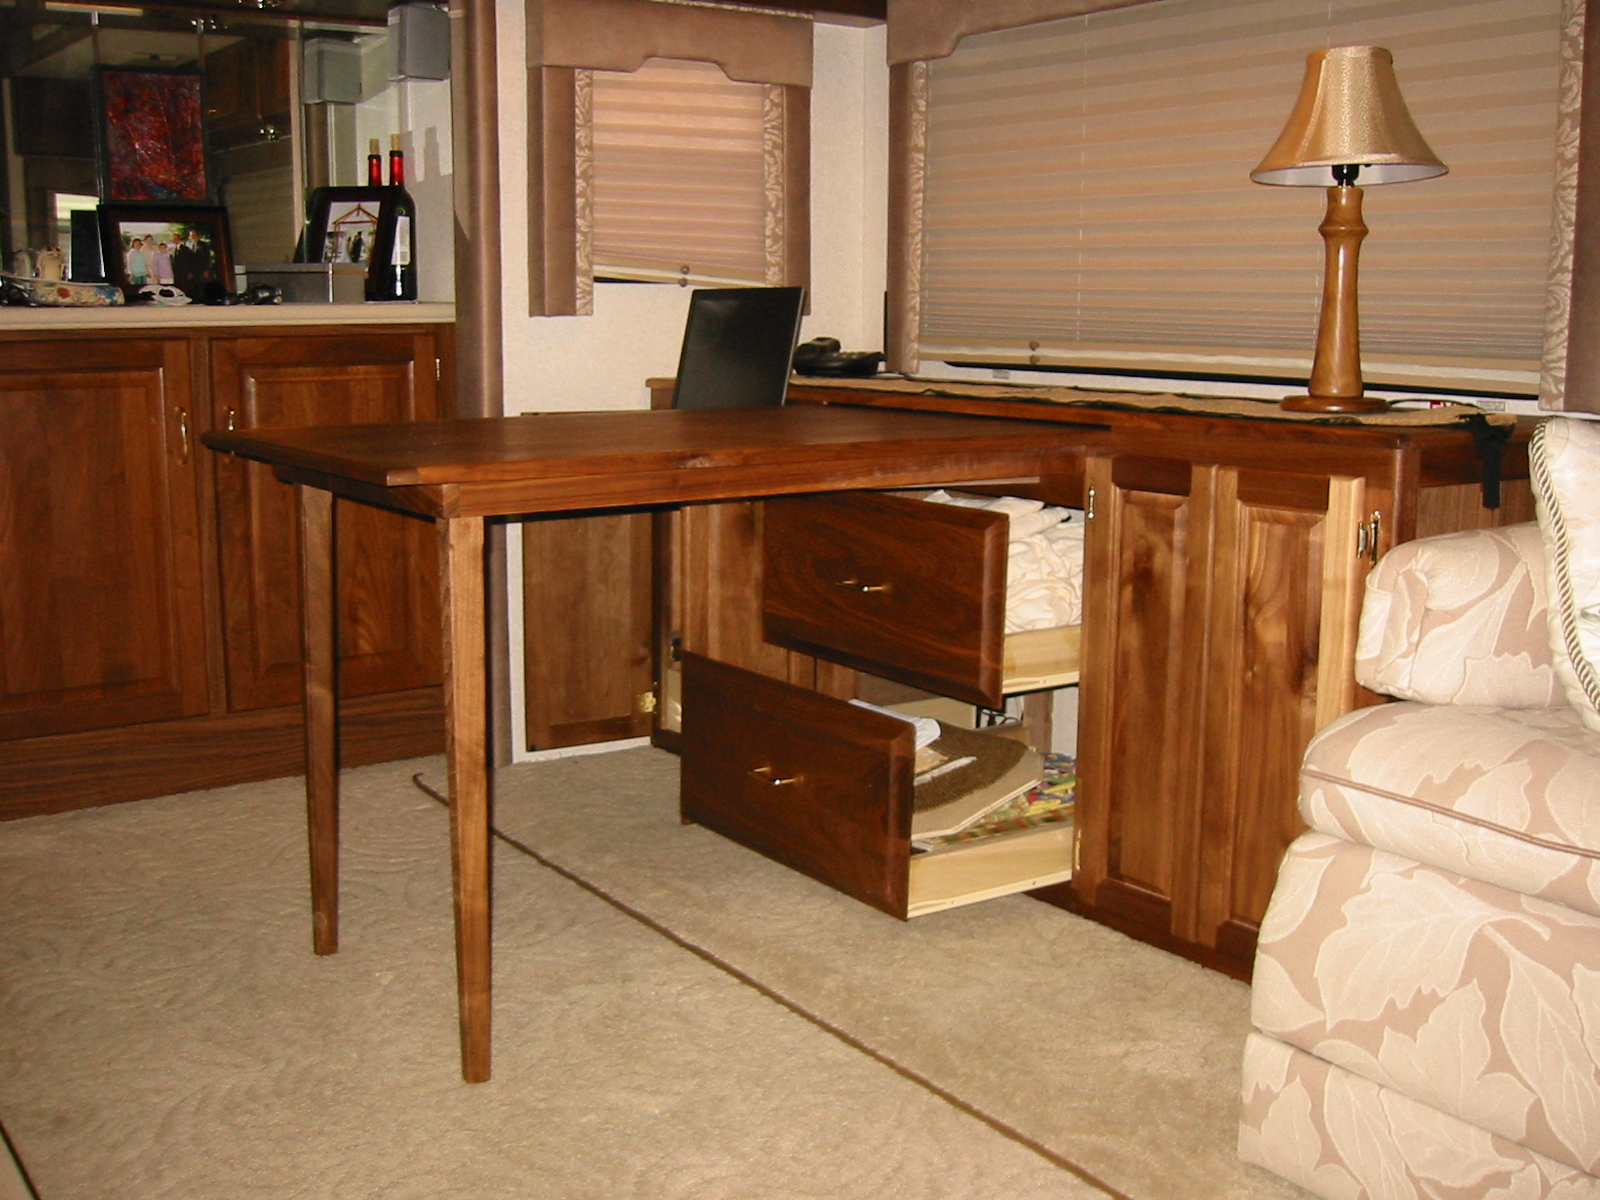 Click image for larger version  Name:RV desk 3.jpg Views:400 Size:846.9 KB ID:51164